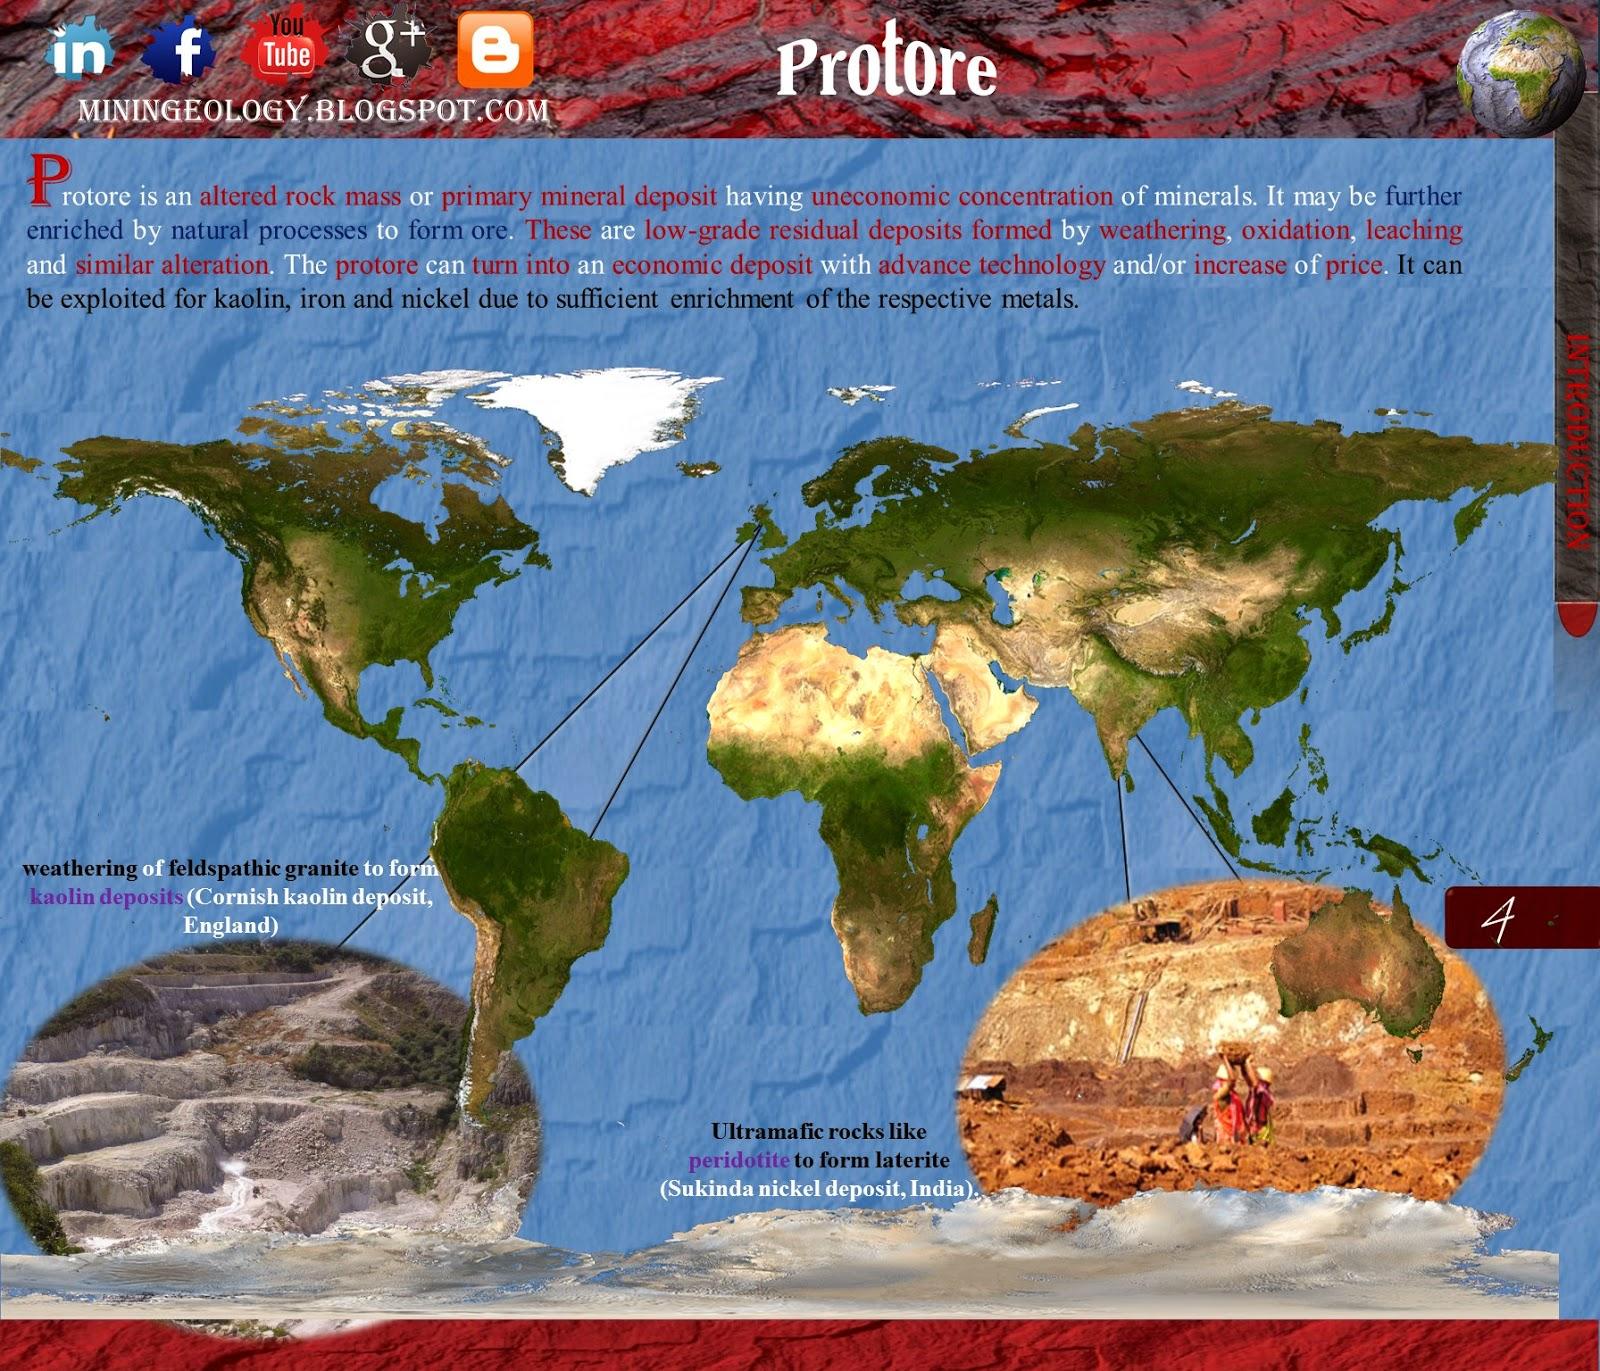 Protore